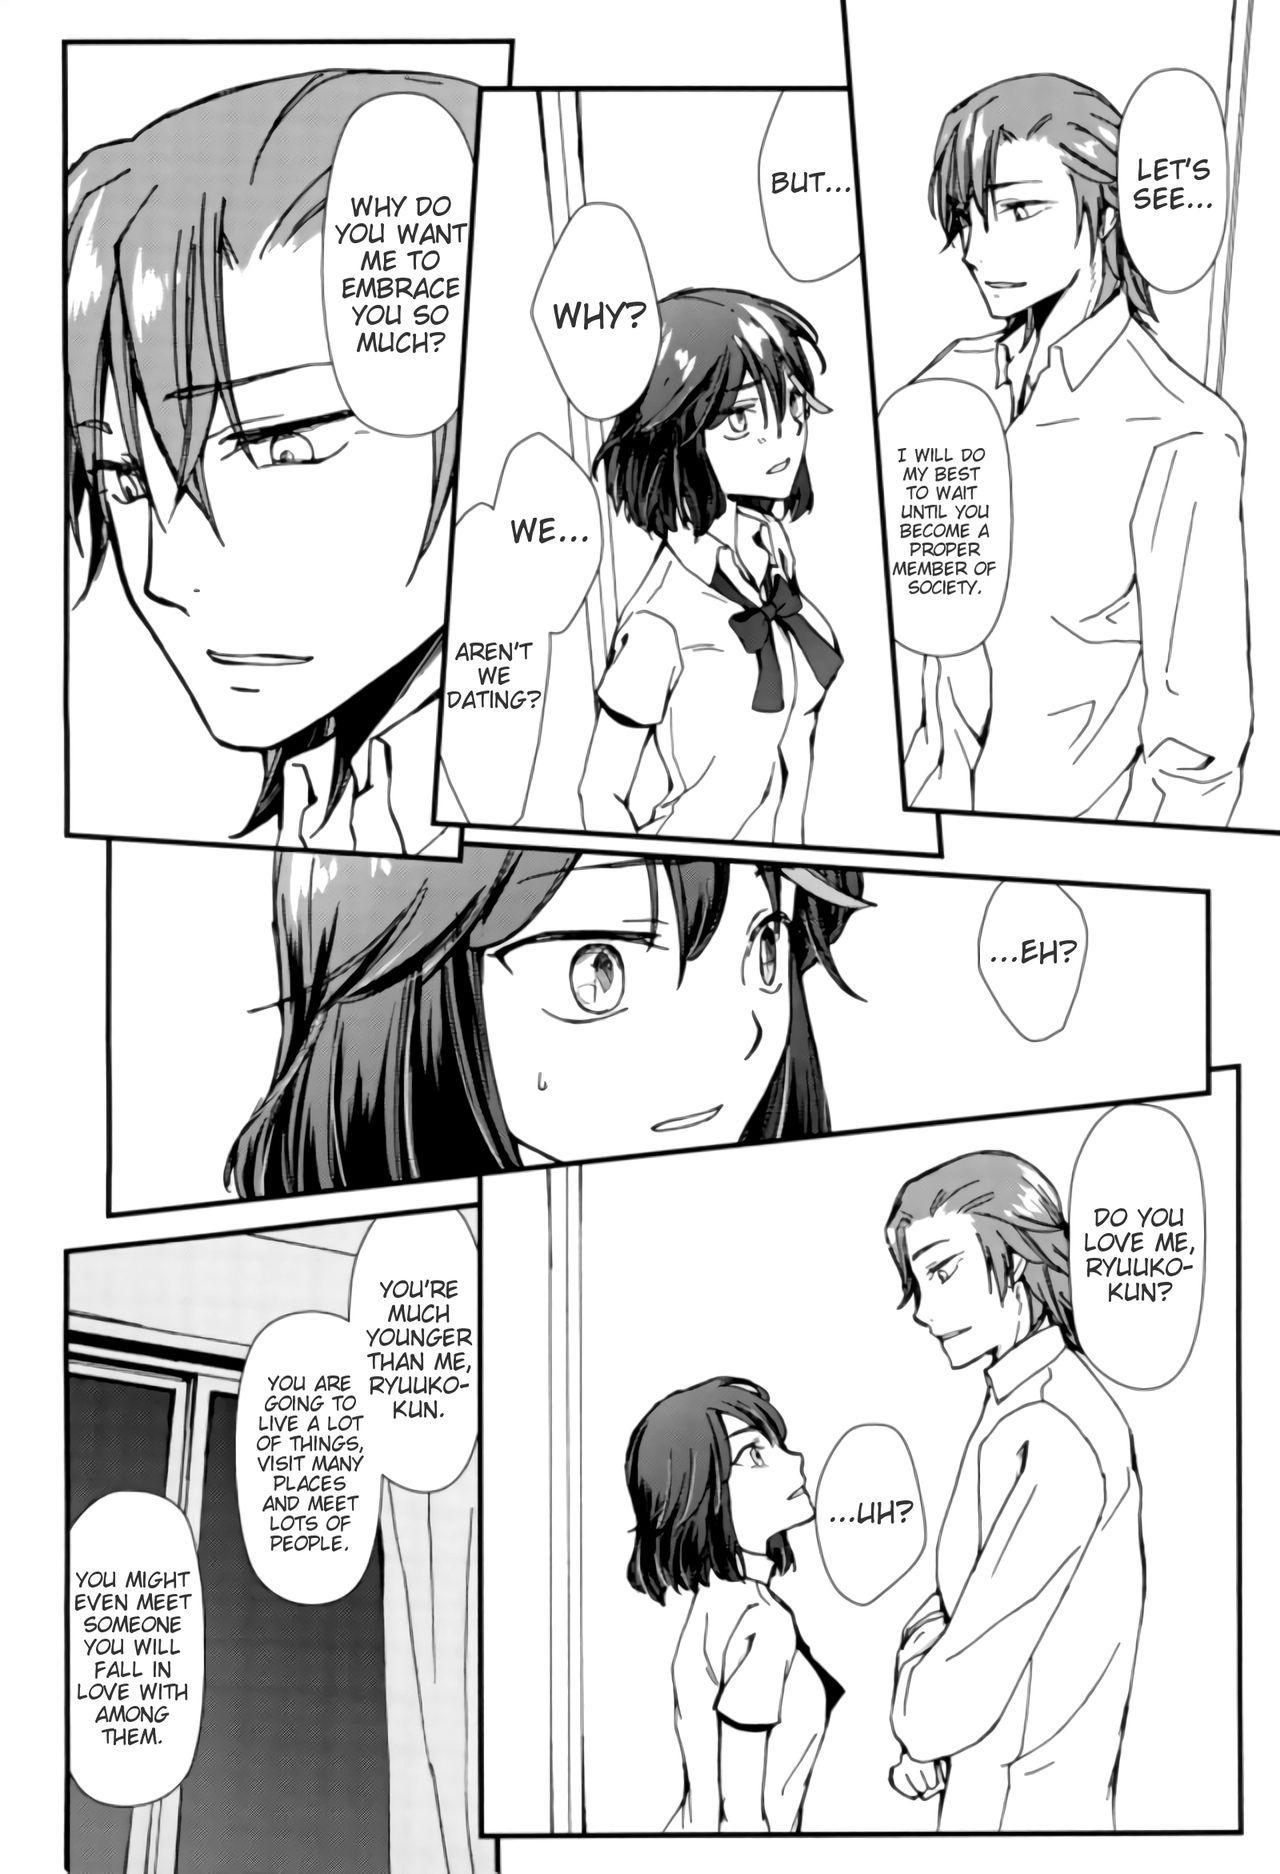 Sekai de Ichiban Kimi ga Suki | You mean the world to me, I'll make love to you tonight. 14